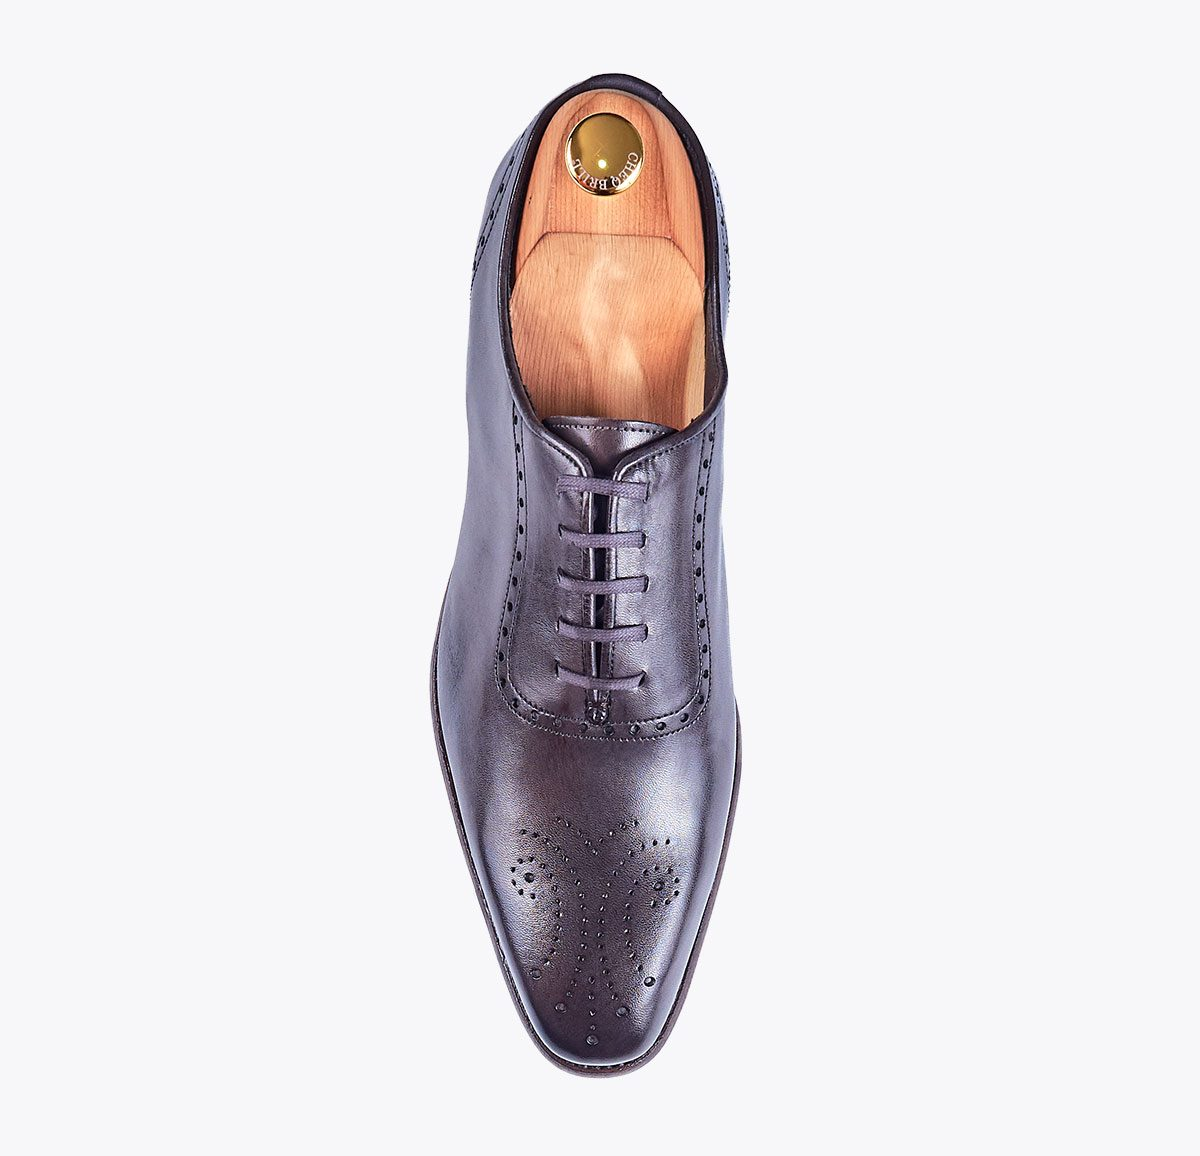 Zapato 0061 hecho a mano en mandalashoes, Santanyí Mallorca. Hand made shoes. Nach Mass Schuhe